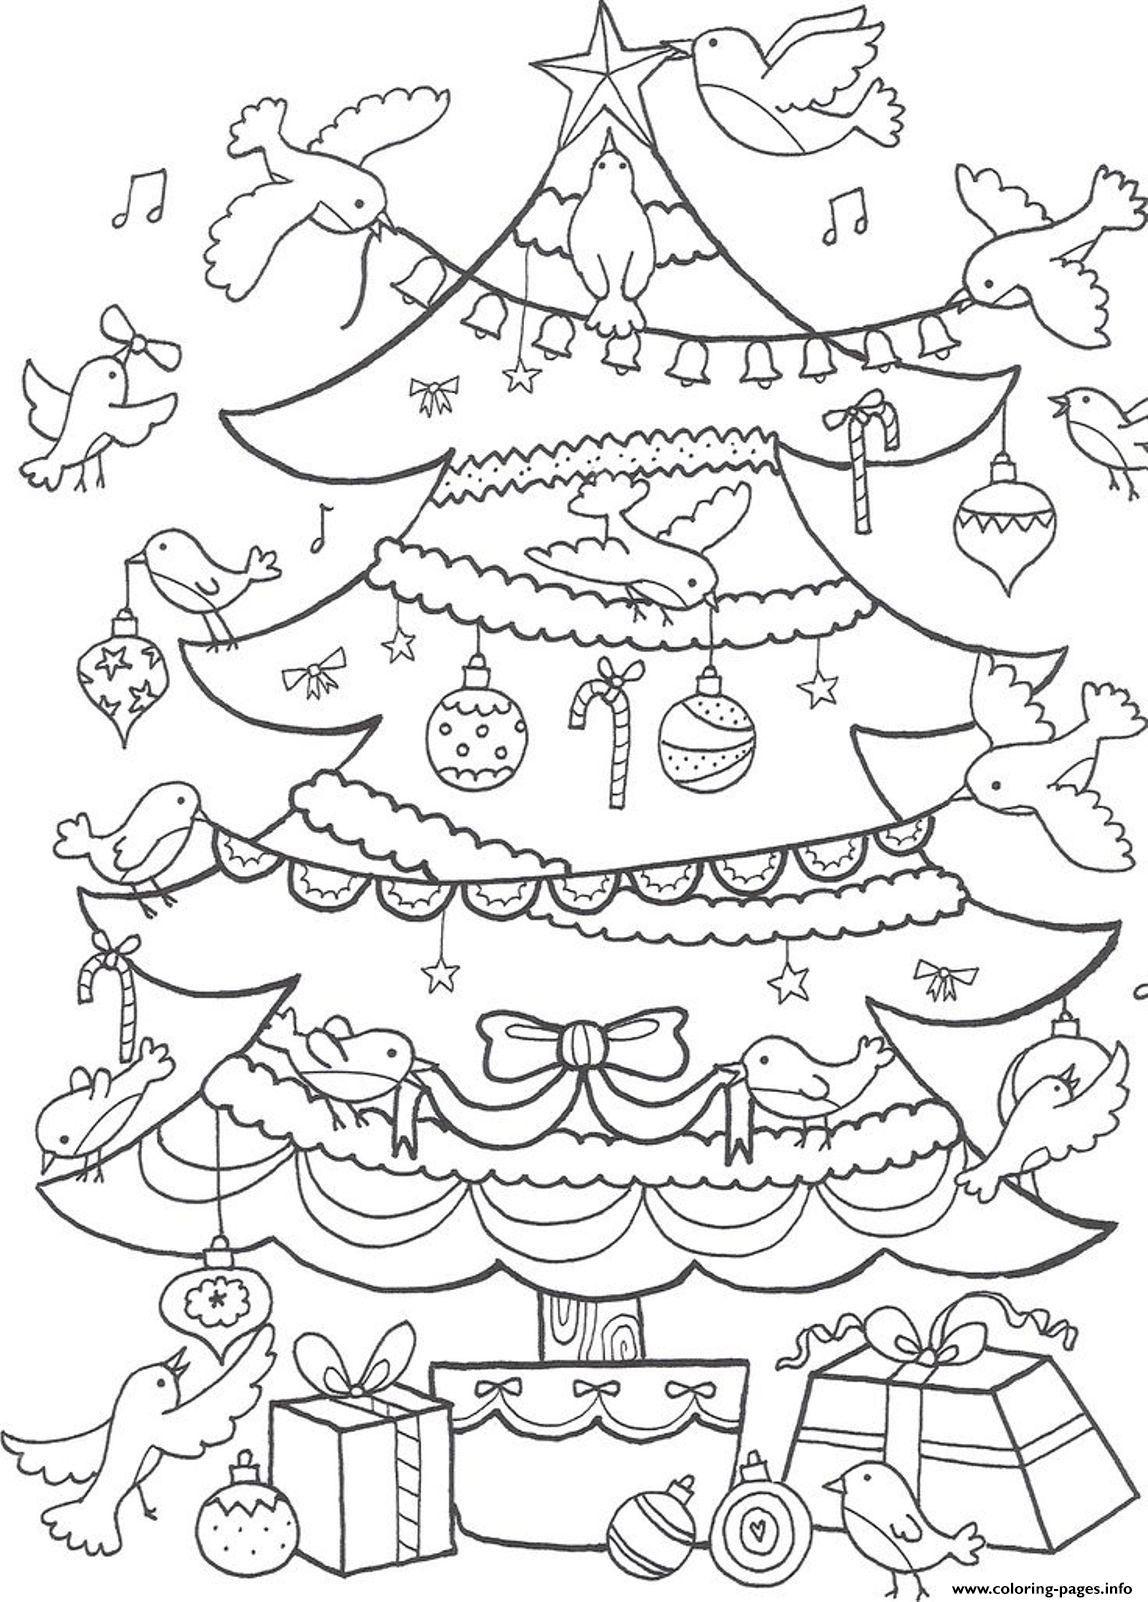 Print Birds Decorating Christmas Tree Coloring Pages Christmas Tree Coloring Page Tree Coloring Page Christmas Coloring Pages